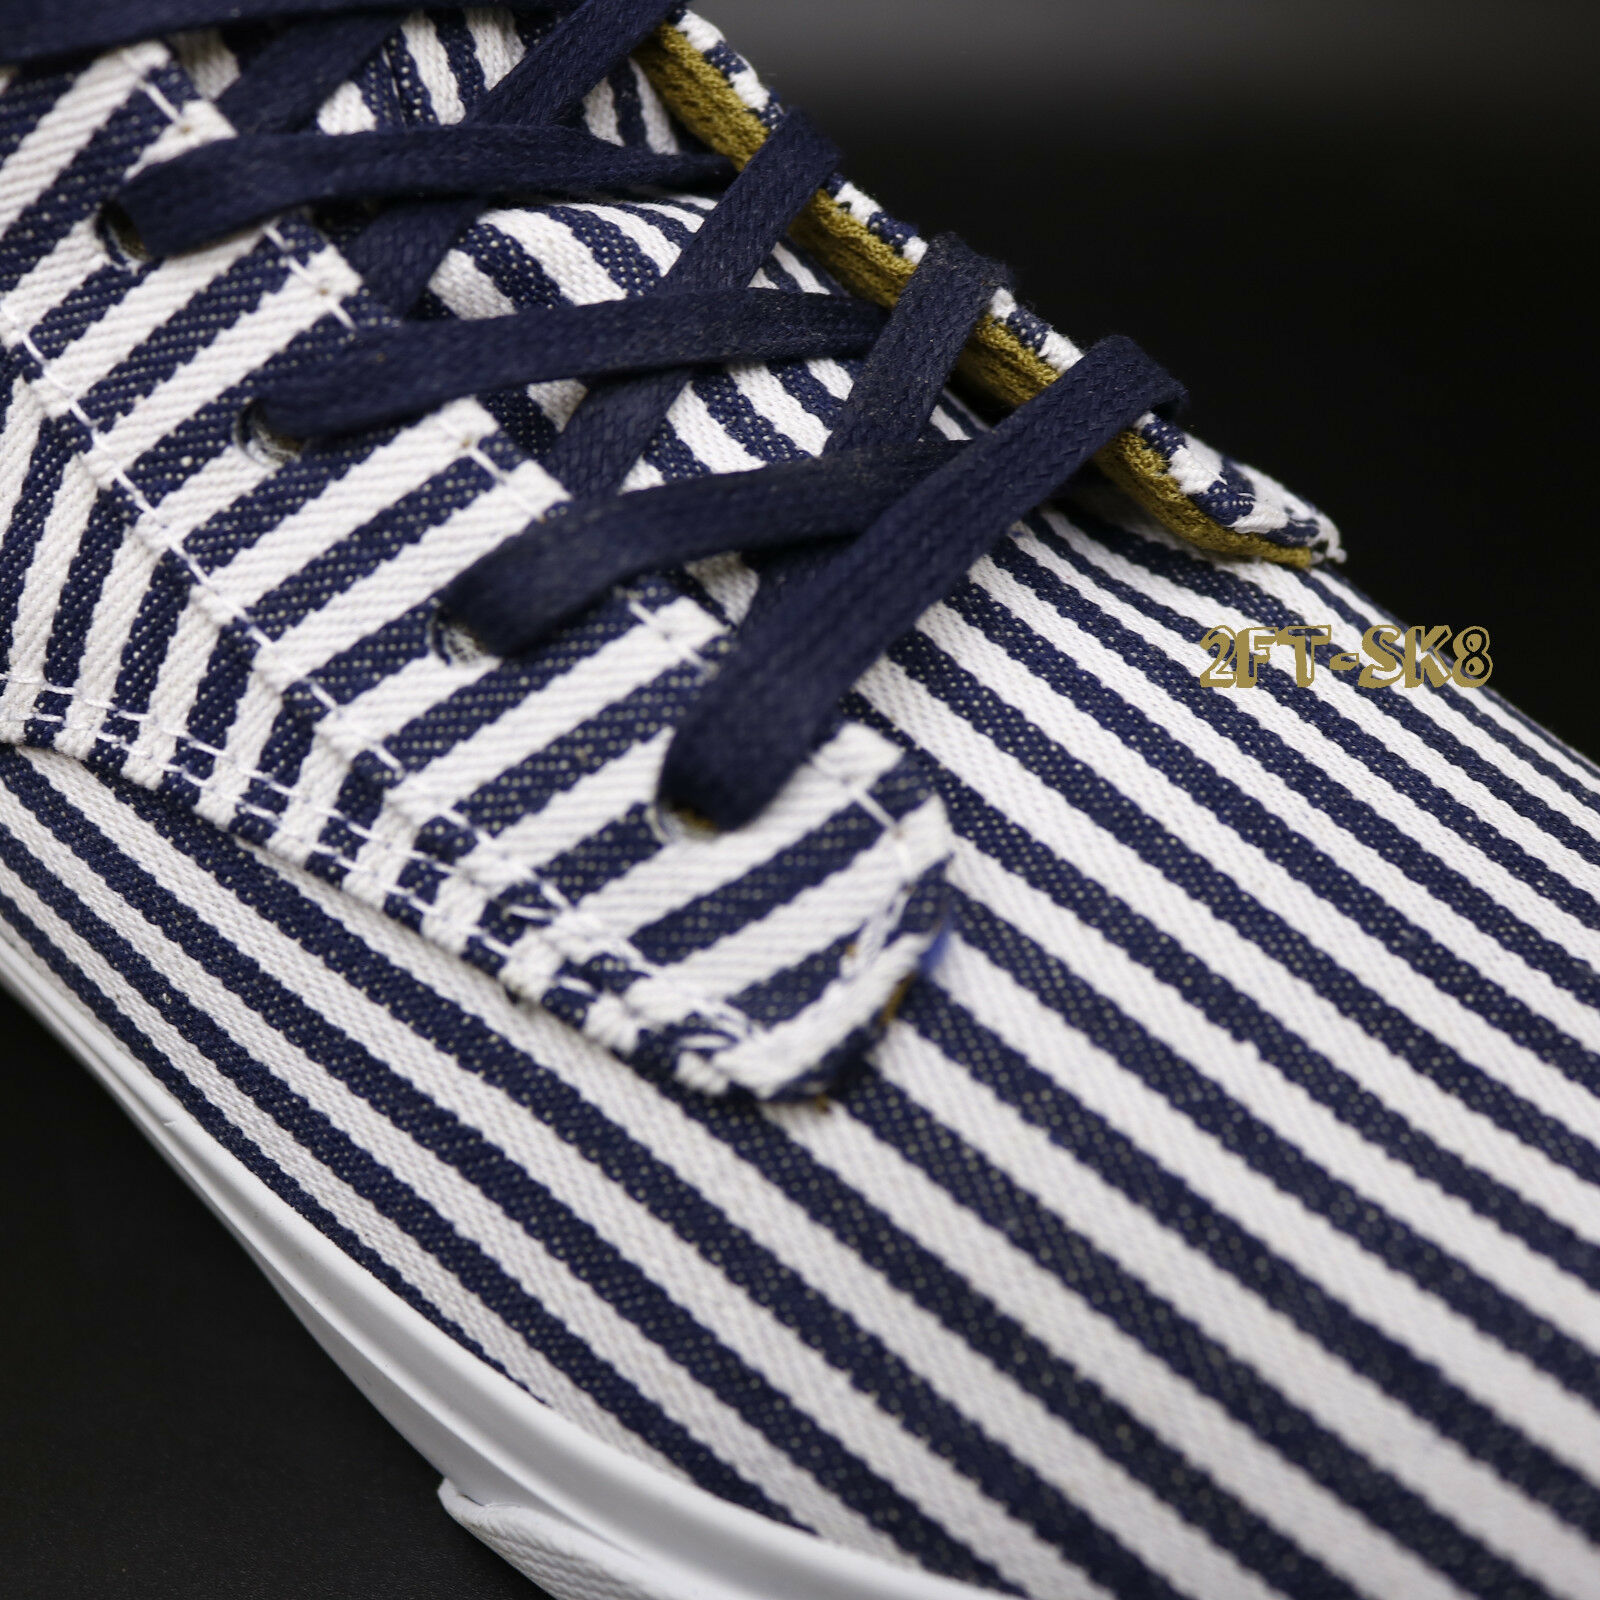 RADII FOOTWEAR TOP BASIC NAVY CREAM STRIPES HIGH TOP FOOTWEAR Schuhe/straight jacket 85181.195 c059fe